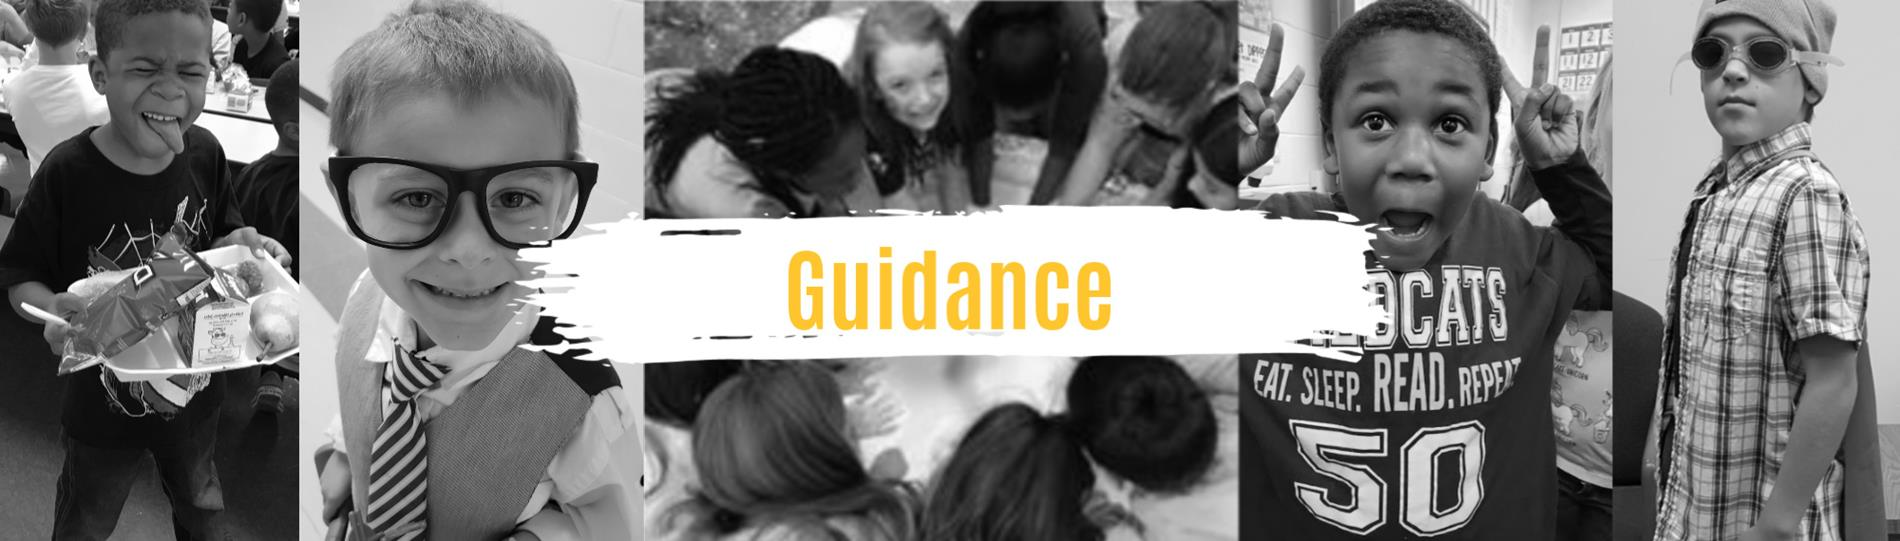 Guidance Banner